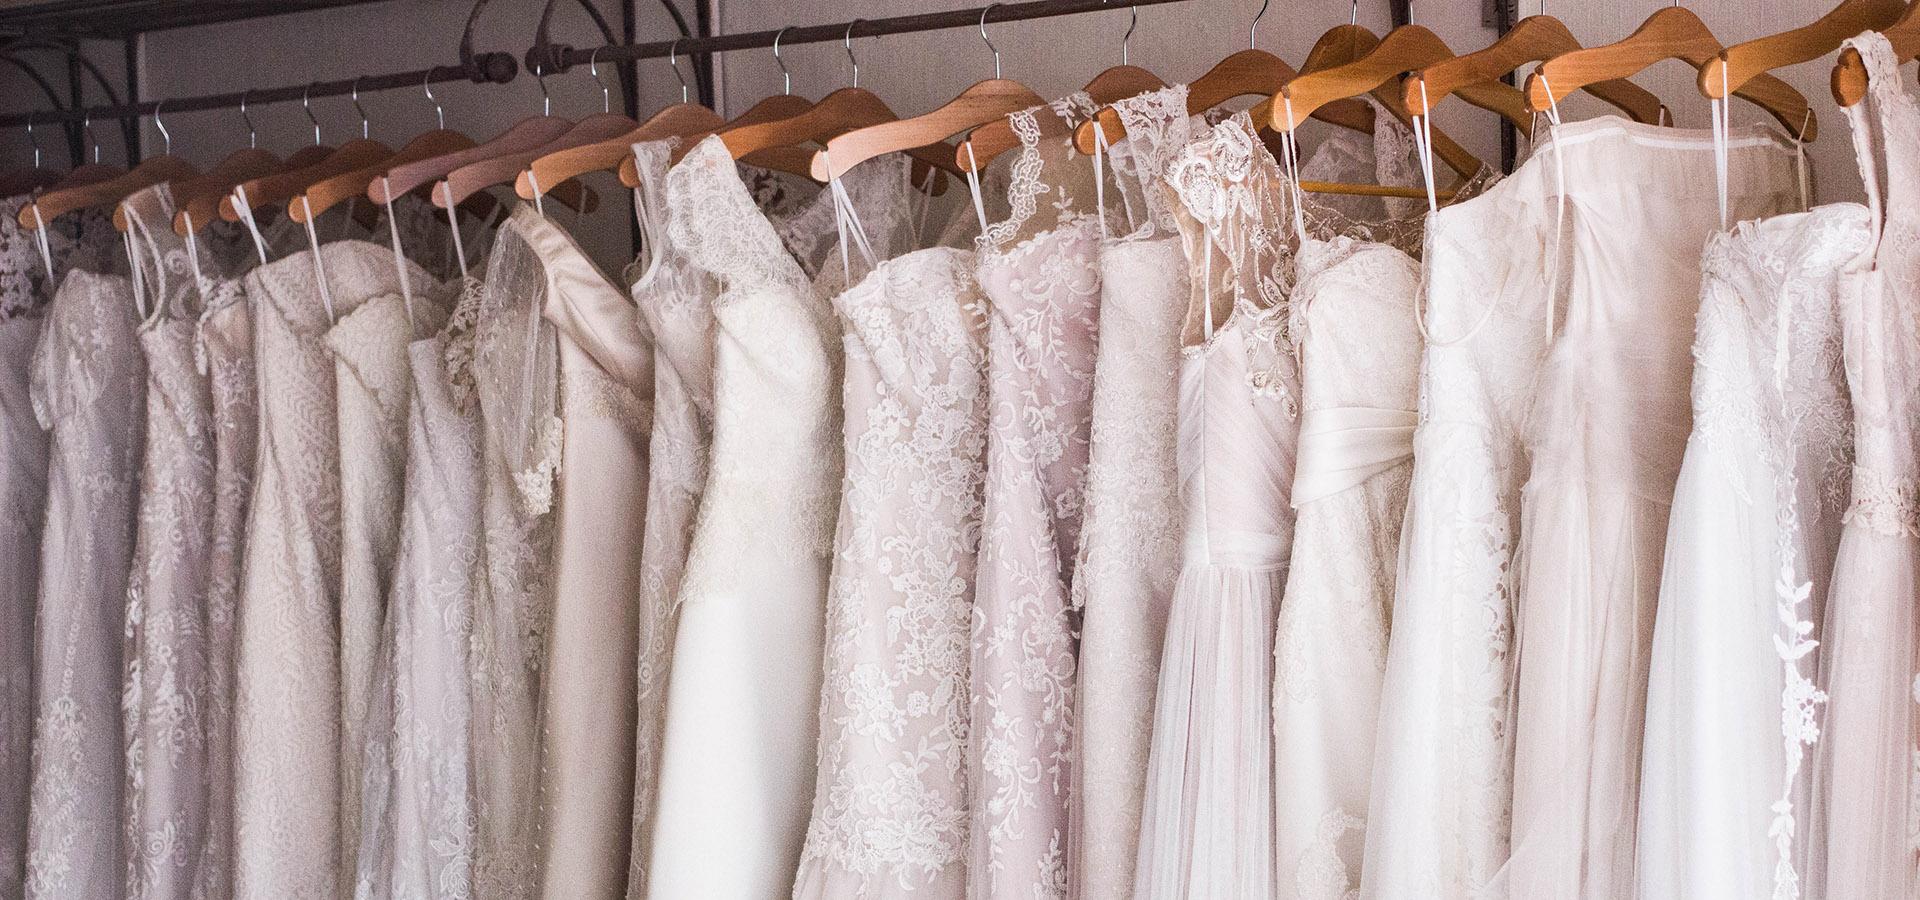 Hero image for 5 Swoon-worthy Wedding Dress Alternatives